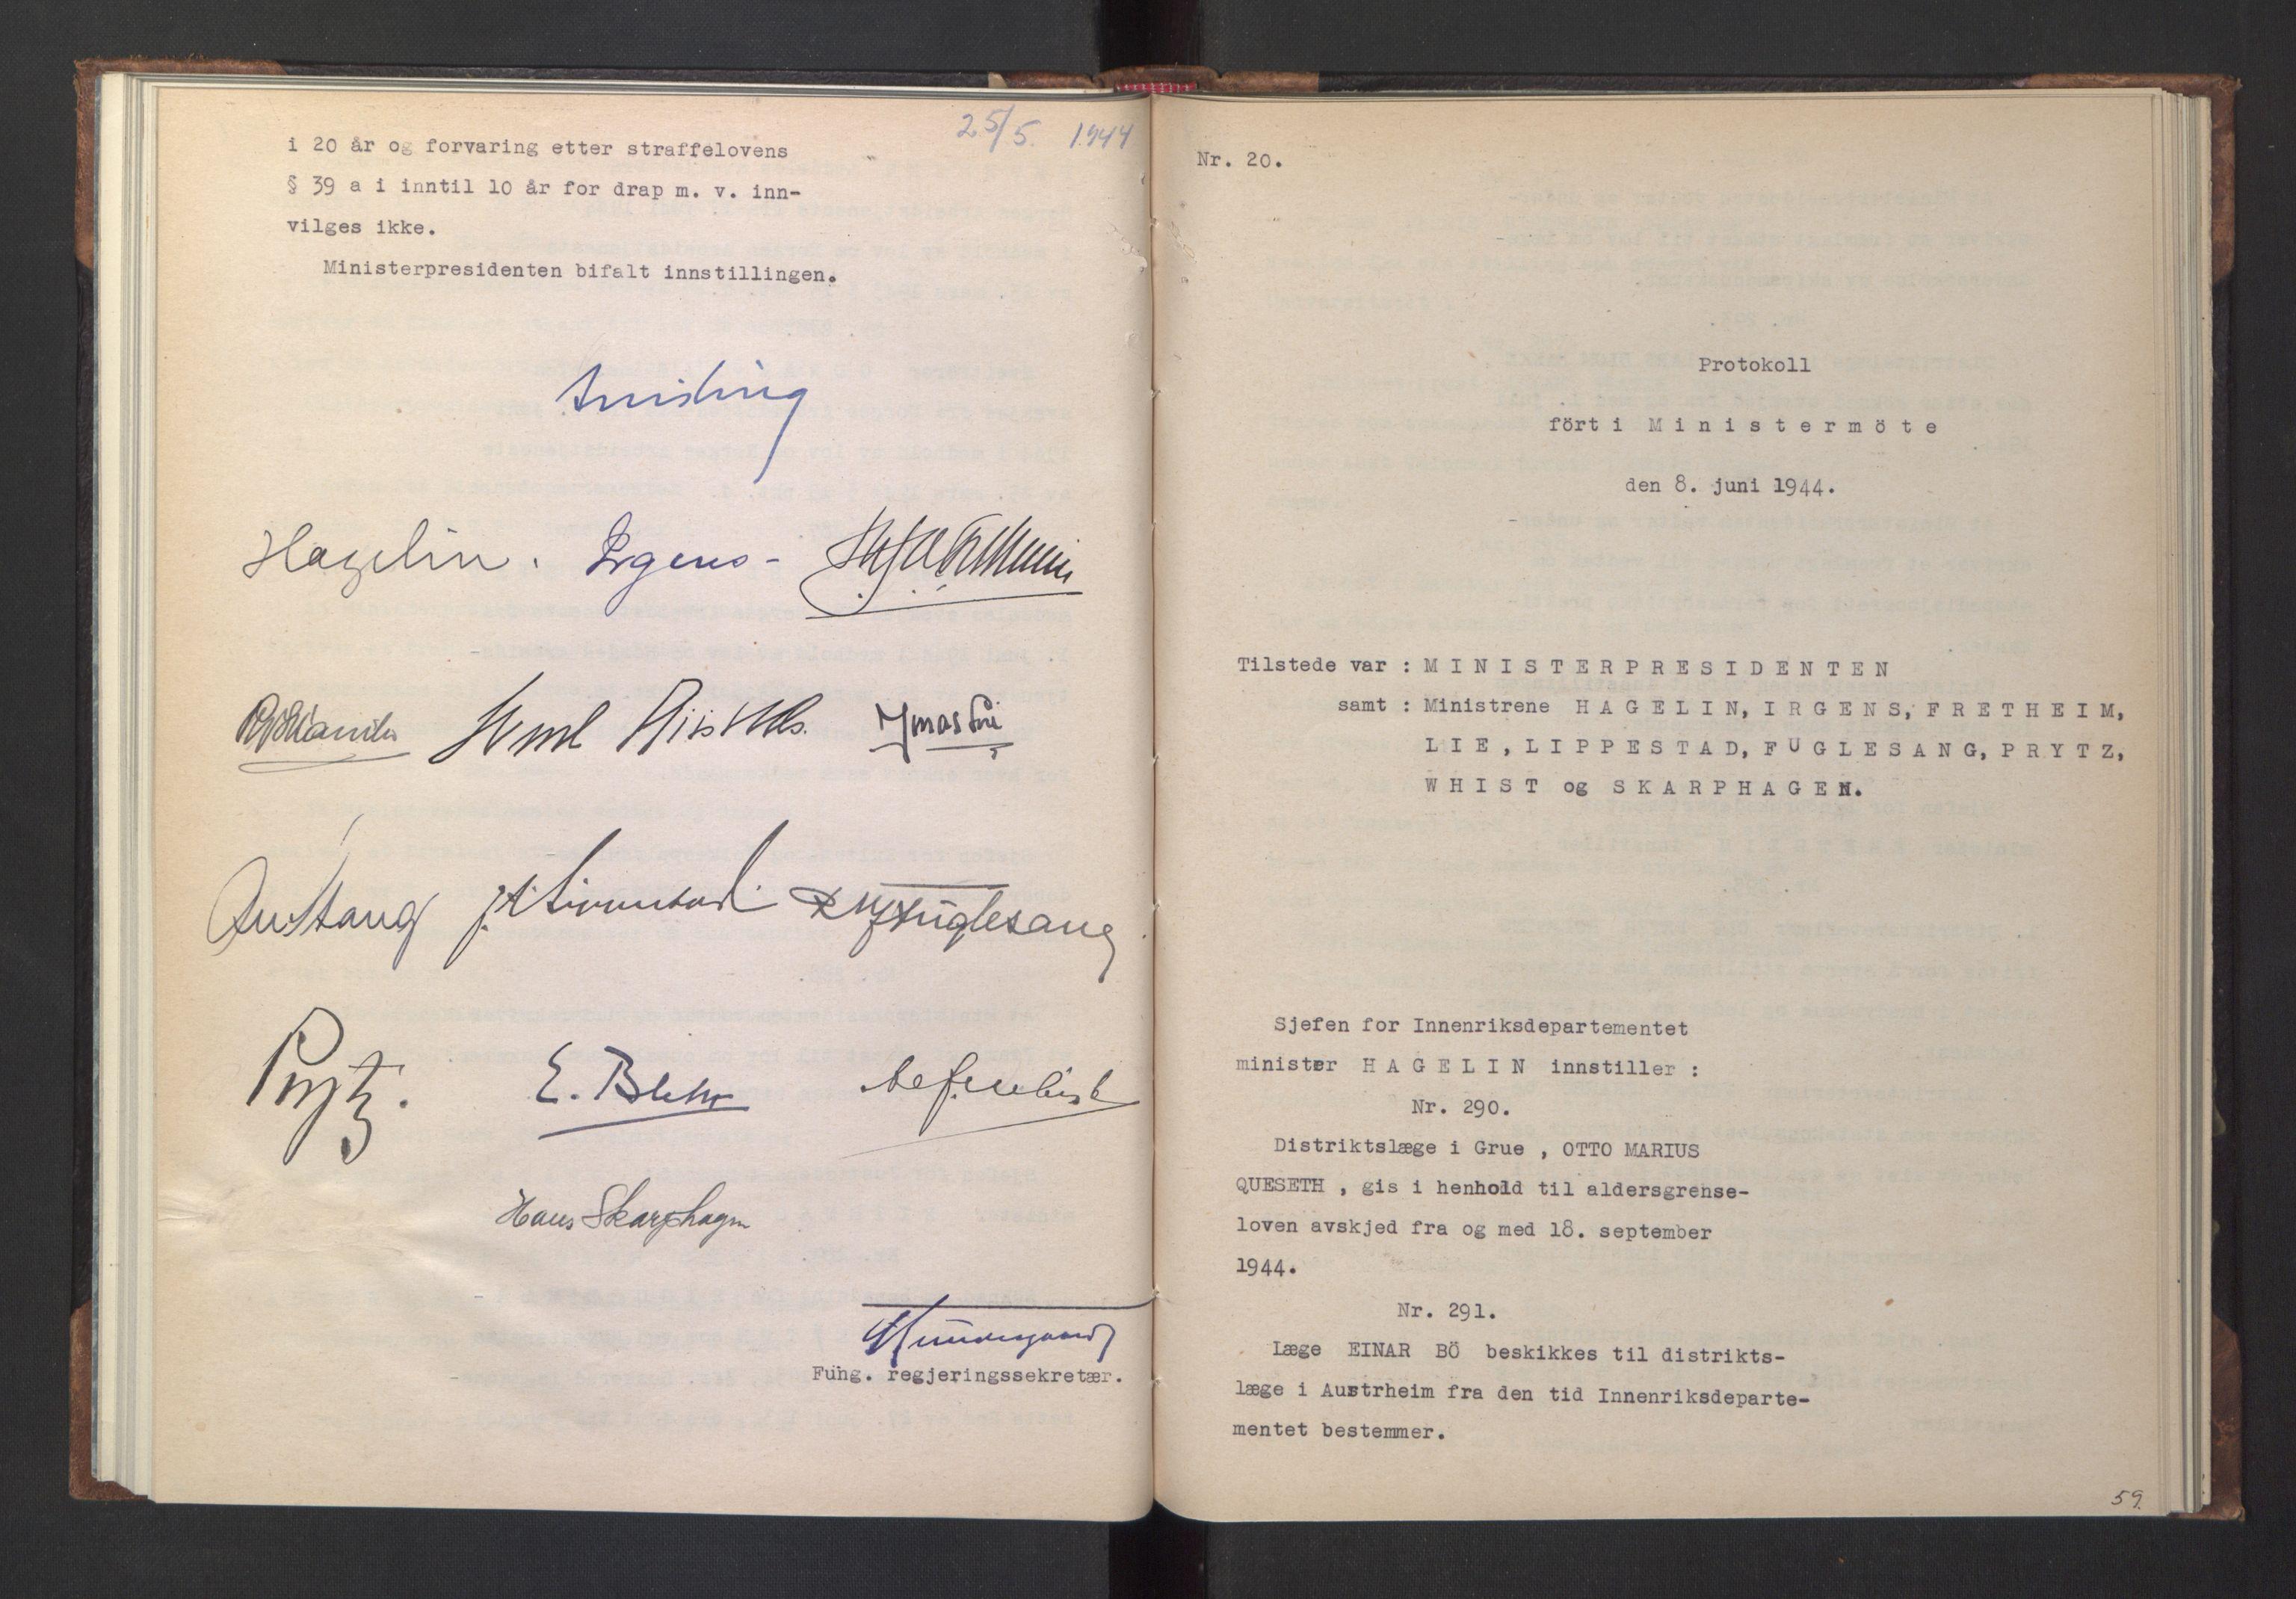 RA, NS-administrasjonen 1940-1945 (Statsrådsekretariatet, de kommisariske statsråder mm), D/Da/L0005: Protokoll fra ministermøter, 1944, s. 58b-59a